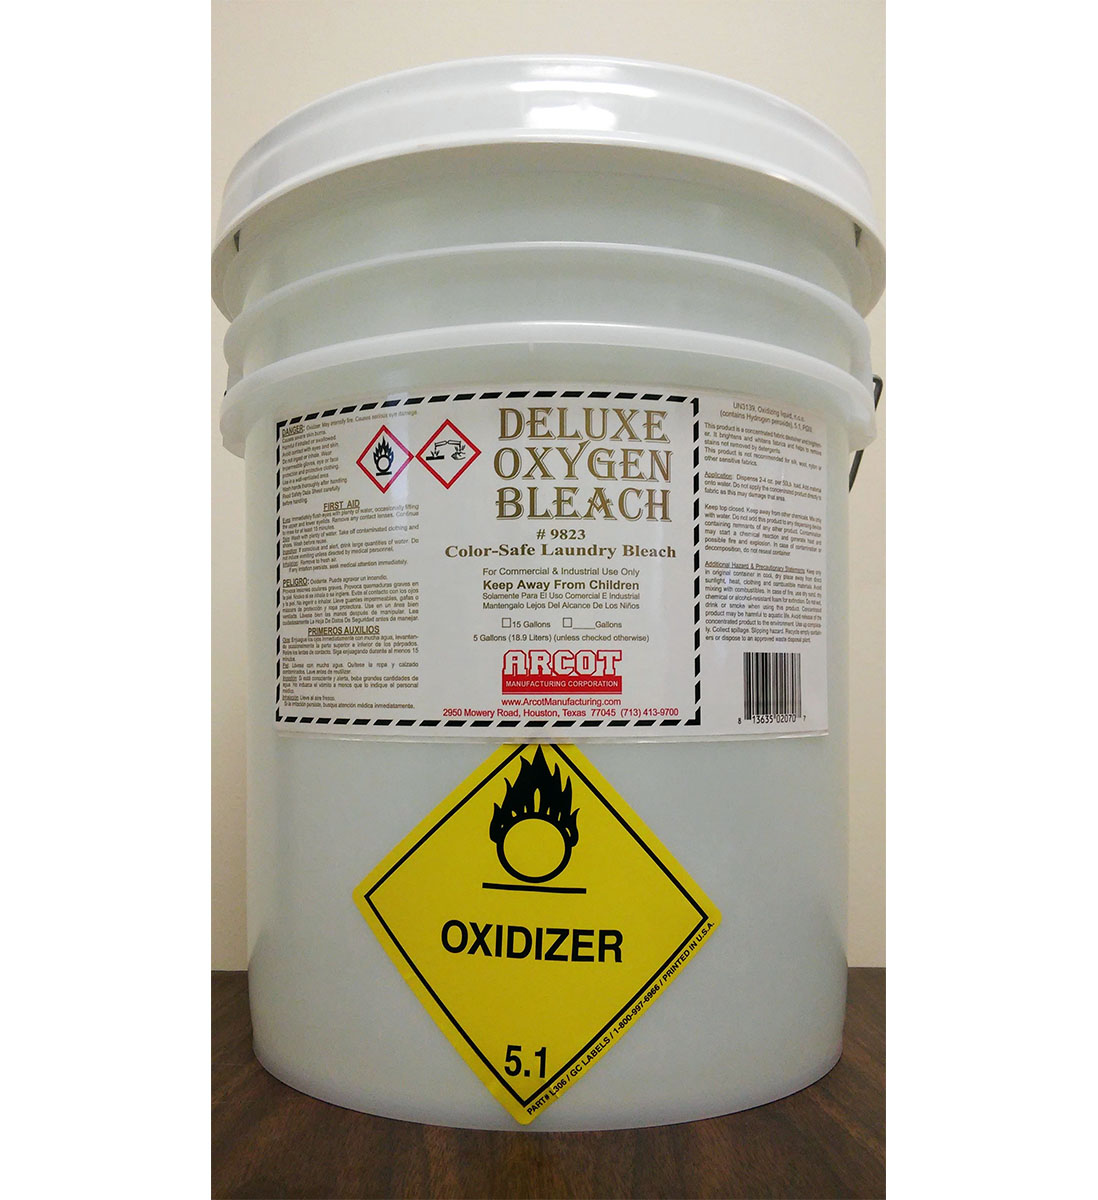 Deluxe Oxygen Bleach